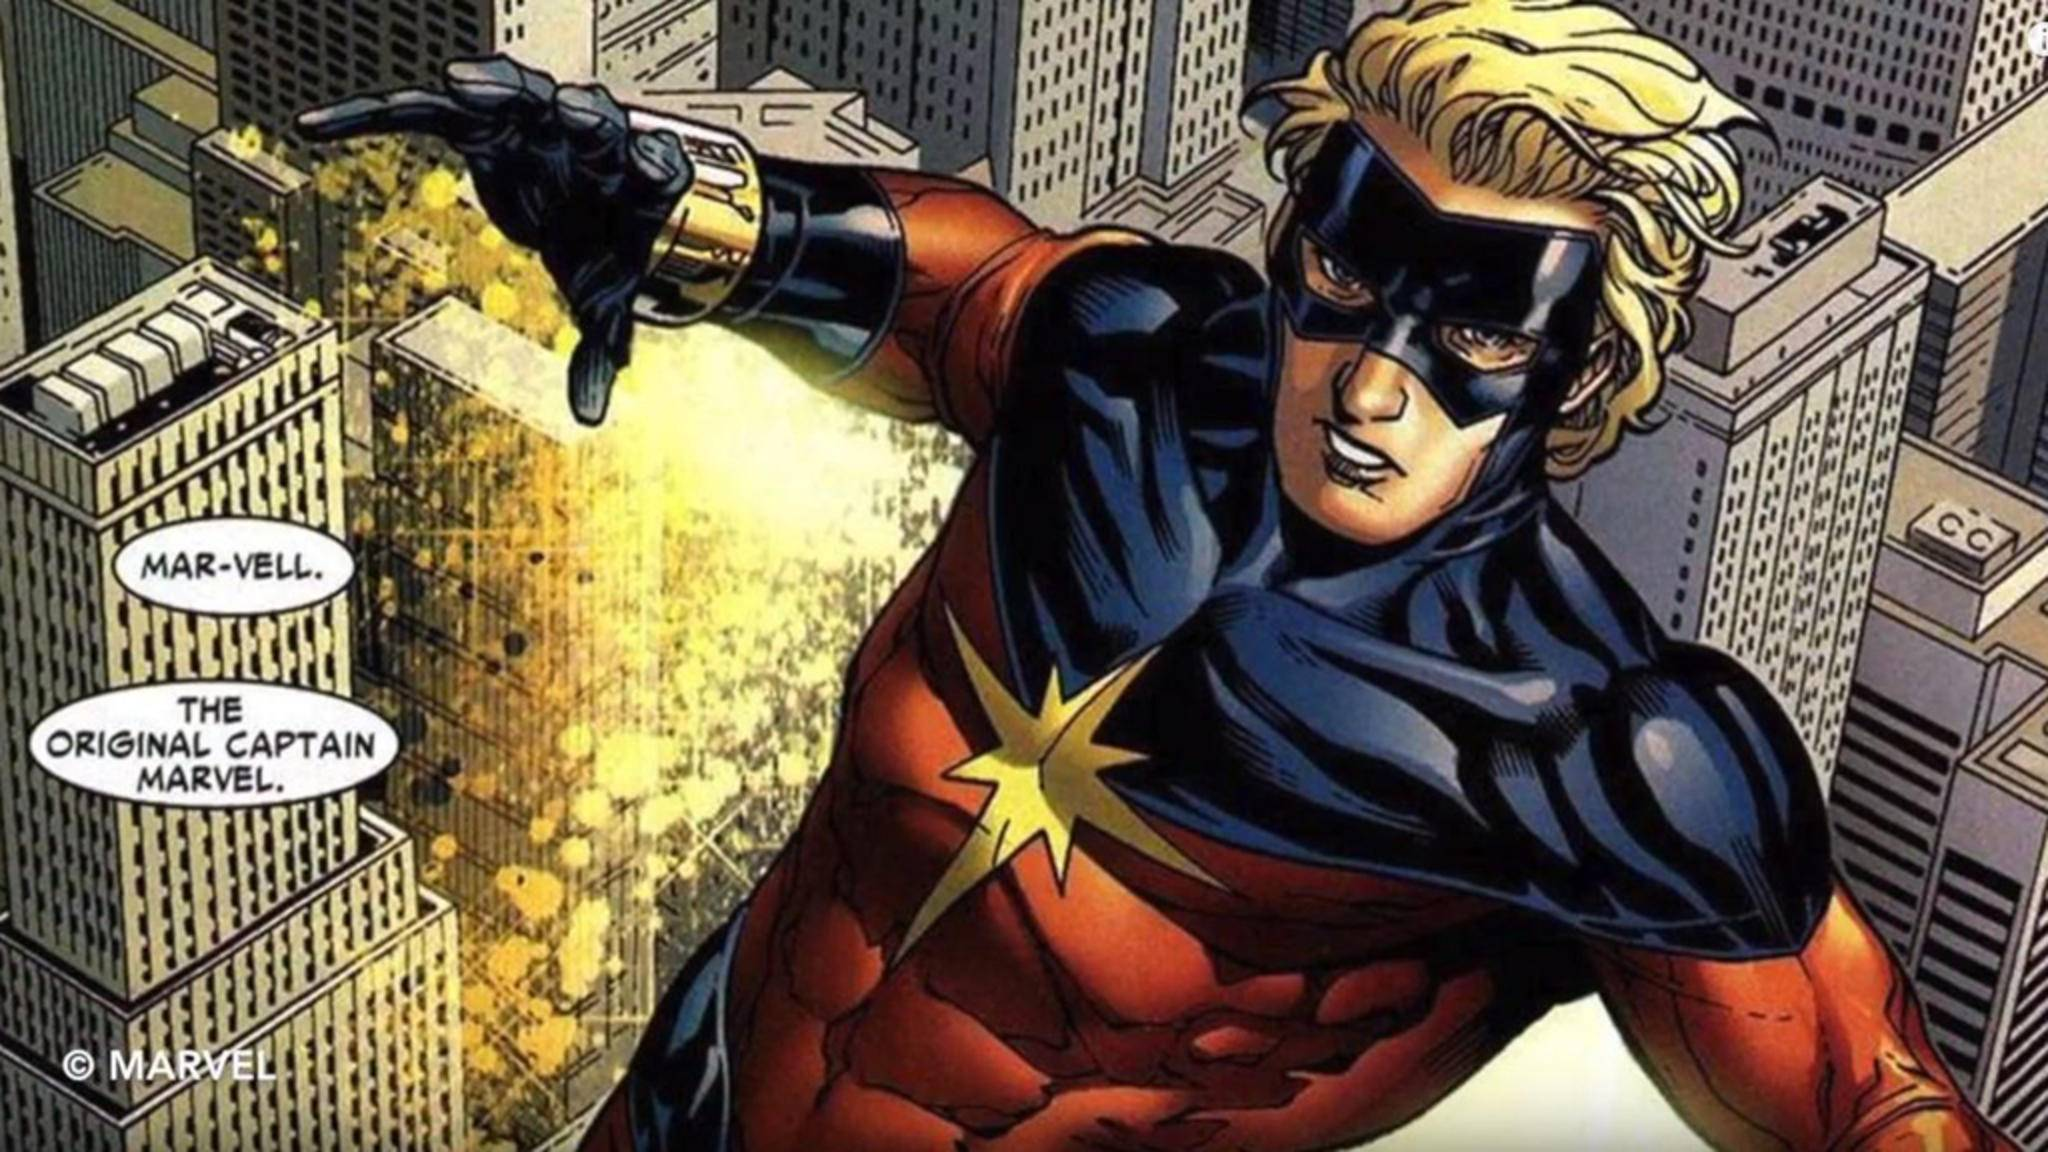 Der Kree Mar-Vell war der erste Captain Marvel in den Marvel-Comics.